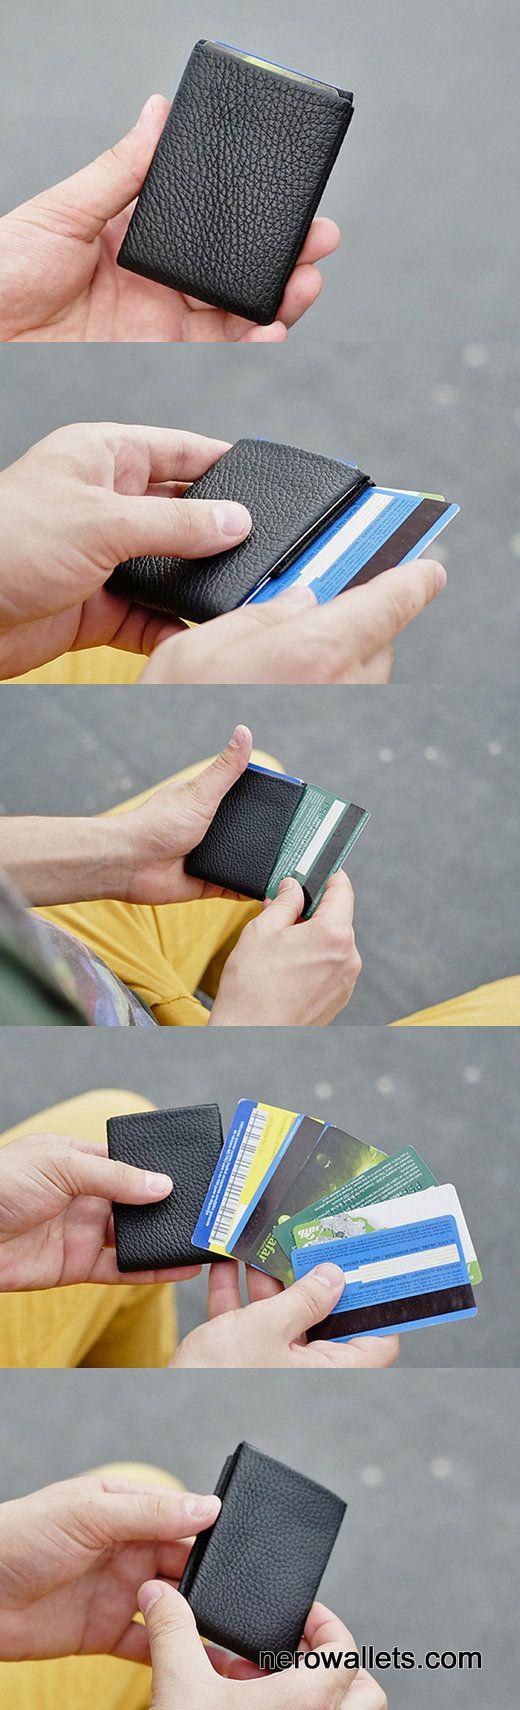 Limited Edition NERO Wallet Minimalist Wallet by NeroWallet